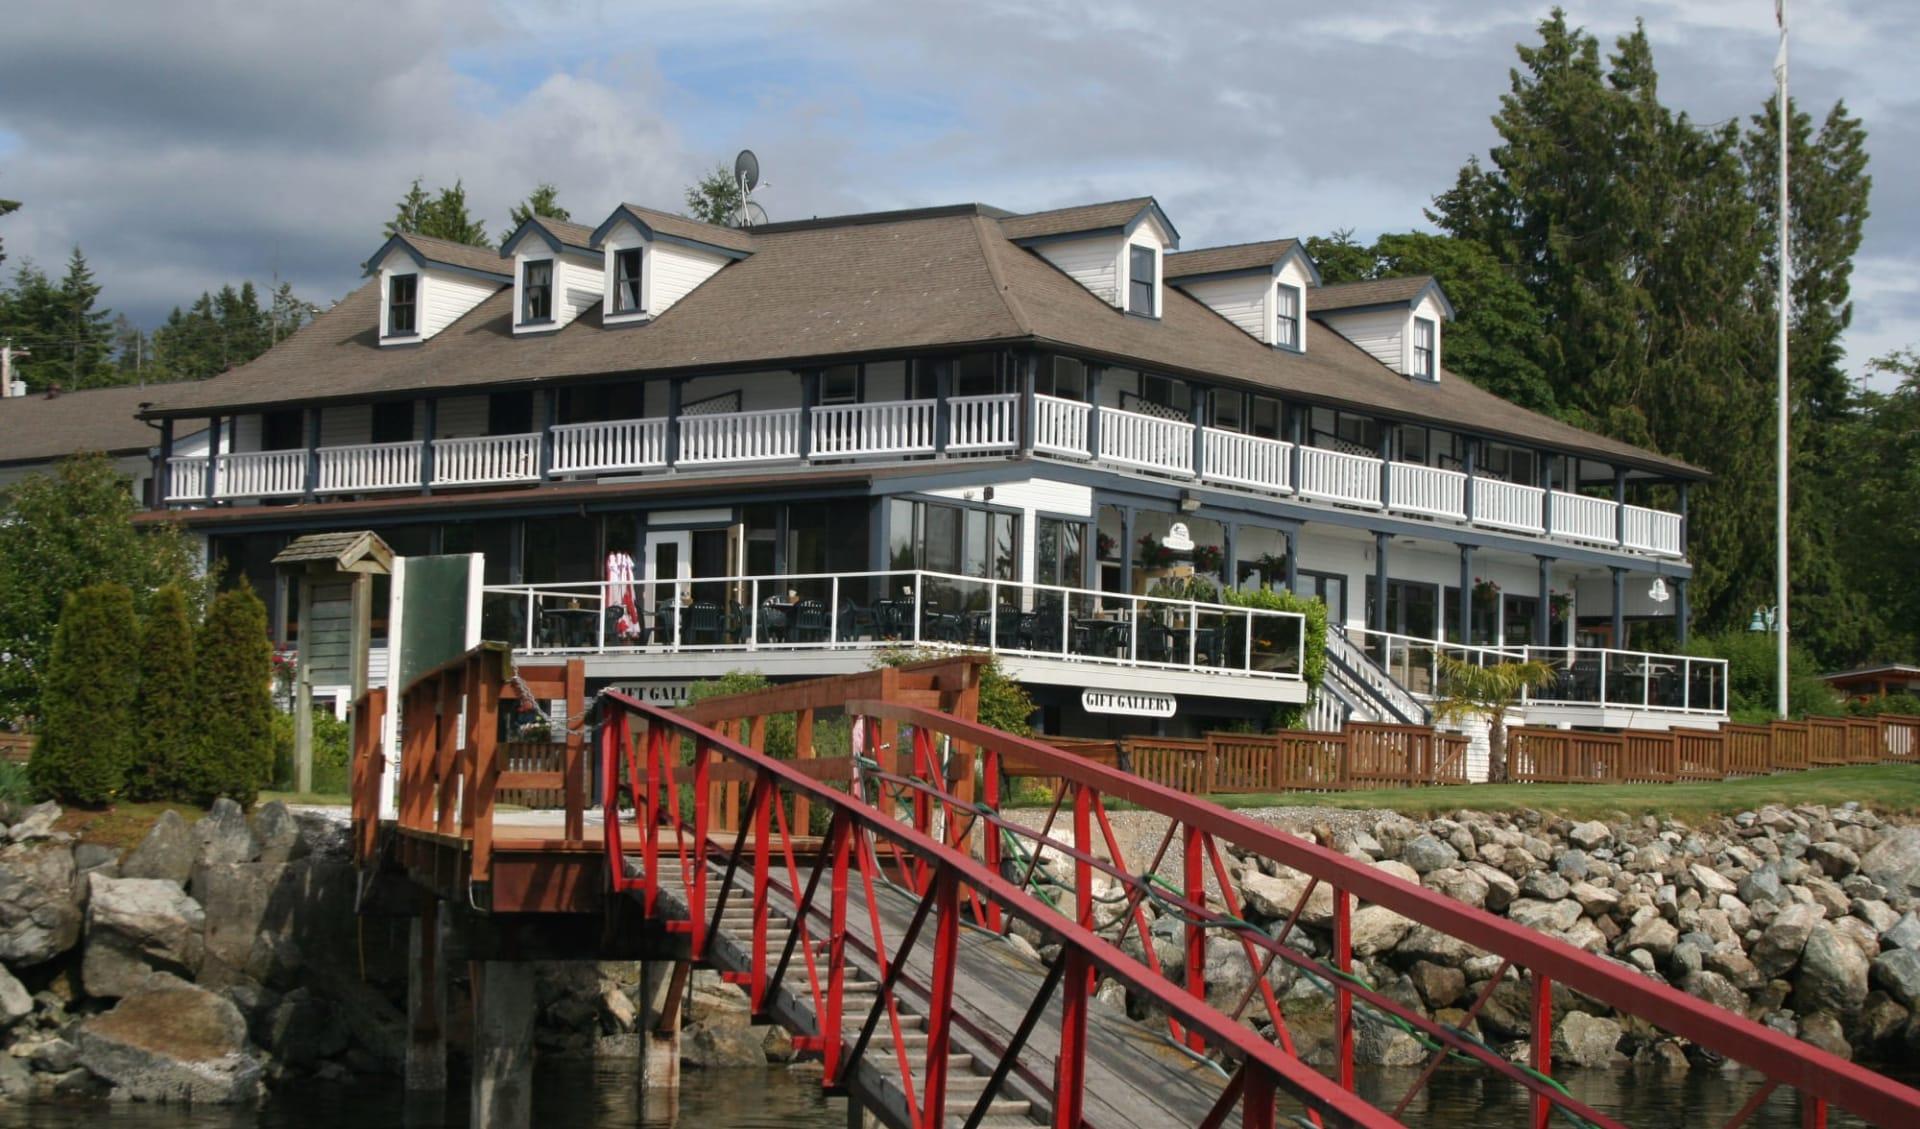 The Lund Resort at Kla ah Men:  Historic Lund Hotel_ViewFromDock2